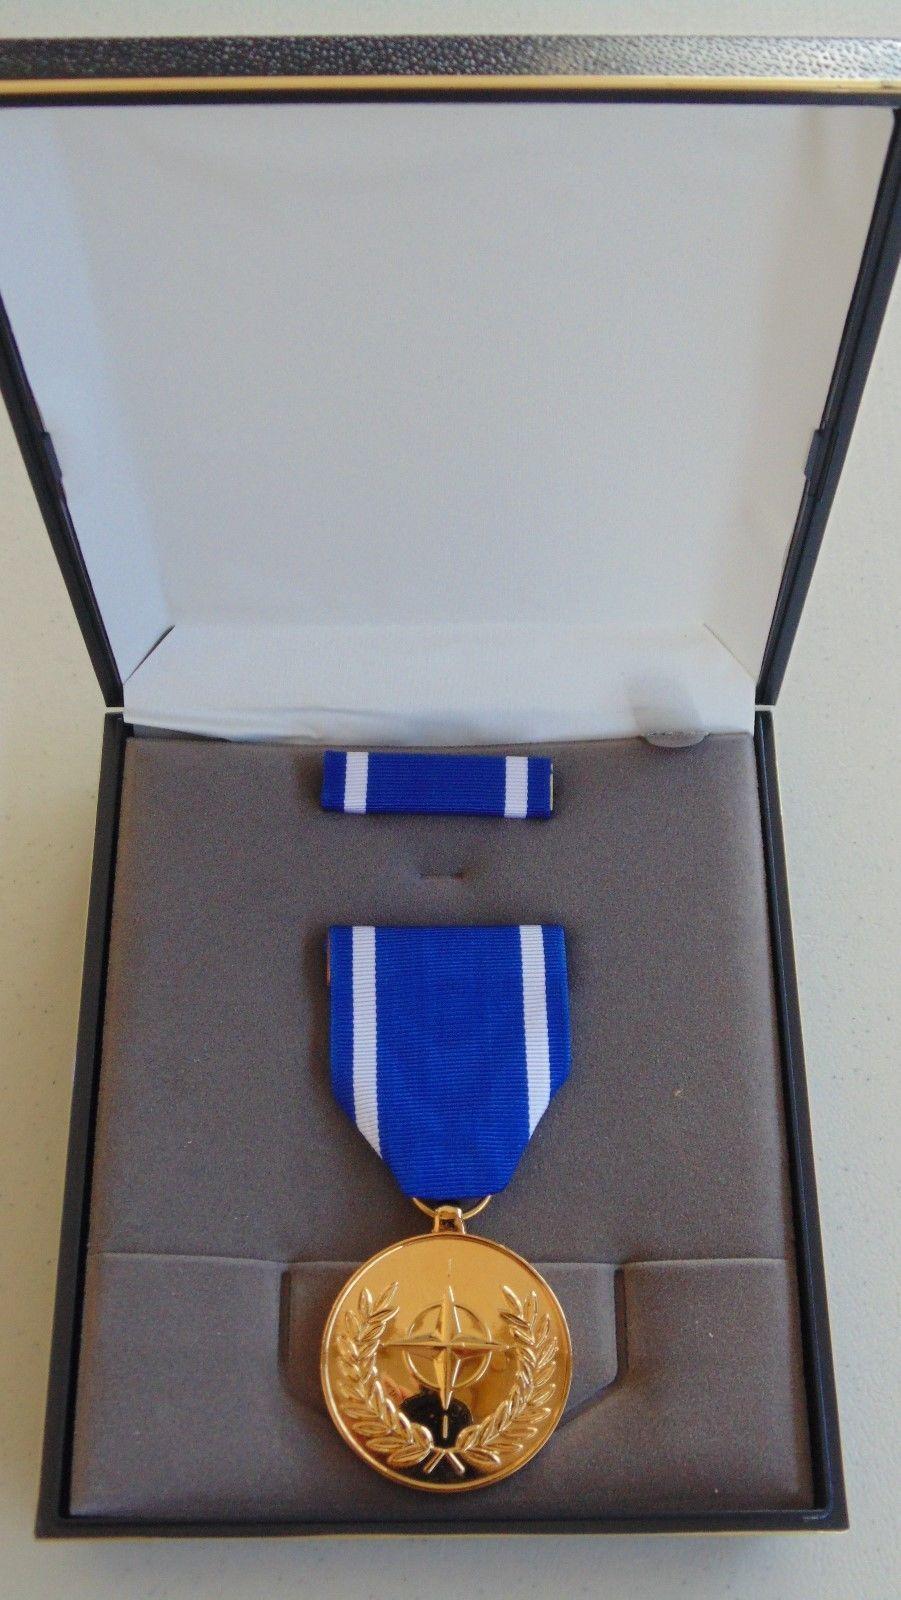 USMC US MARINE CORPS & FLEET MARINES UNISSUED CASED NATO SERVICE MEDAL SET #15 - $29.69